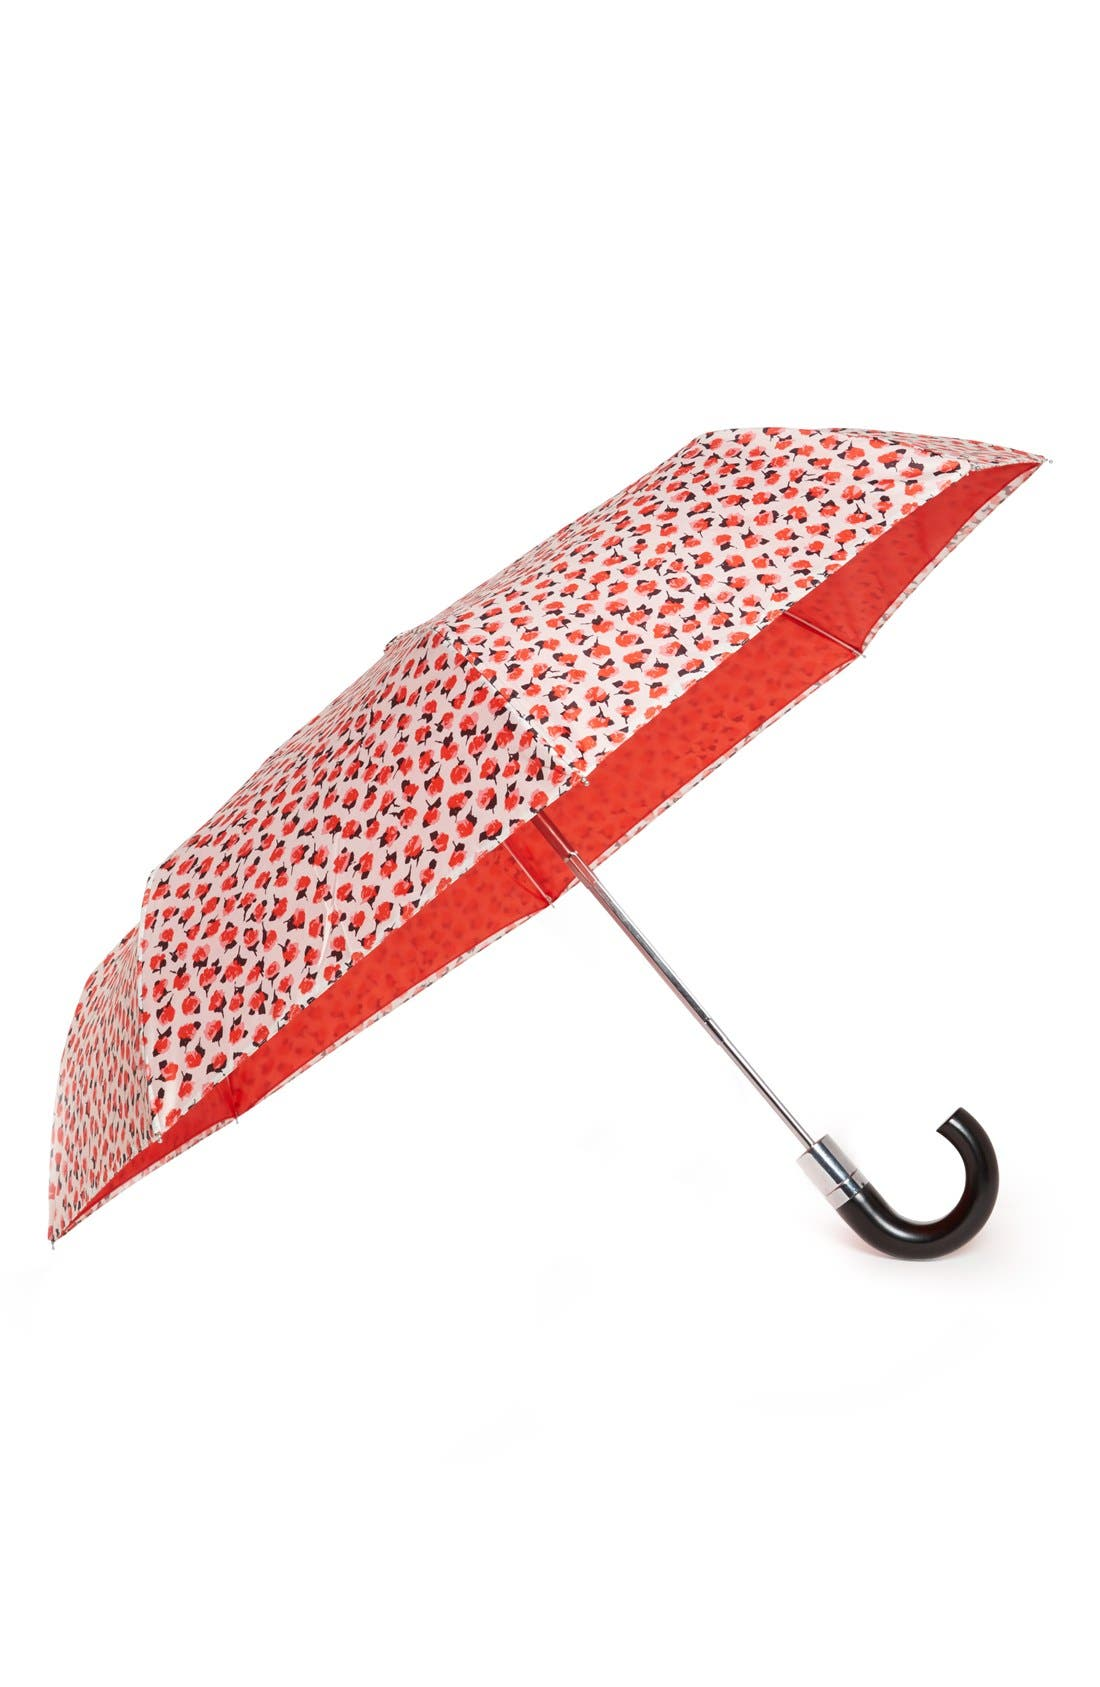 Alternate Image 1 Selected - kate spade new york 'roses' travel umbrella